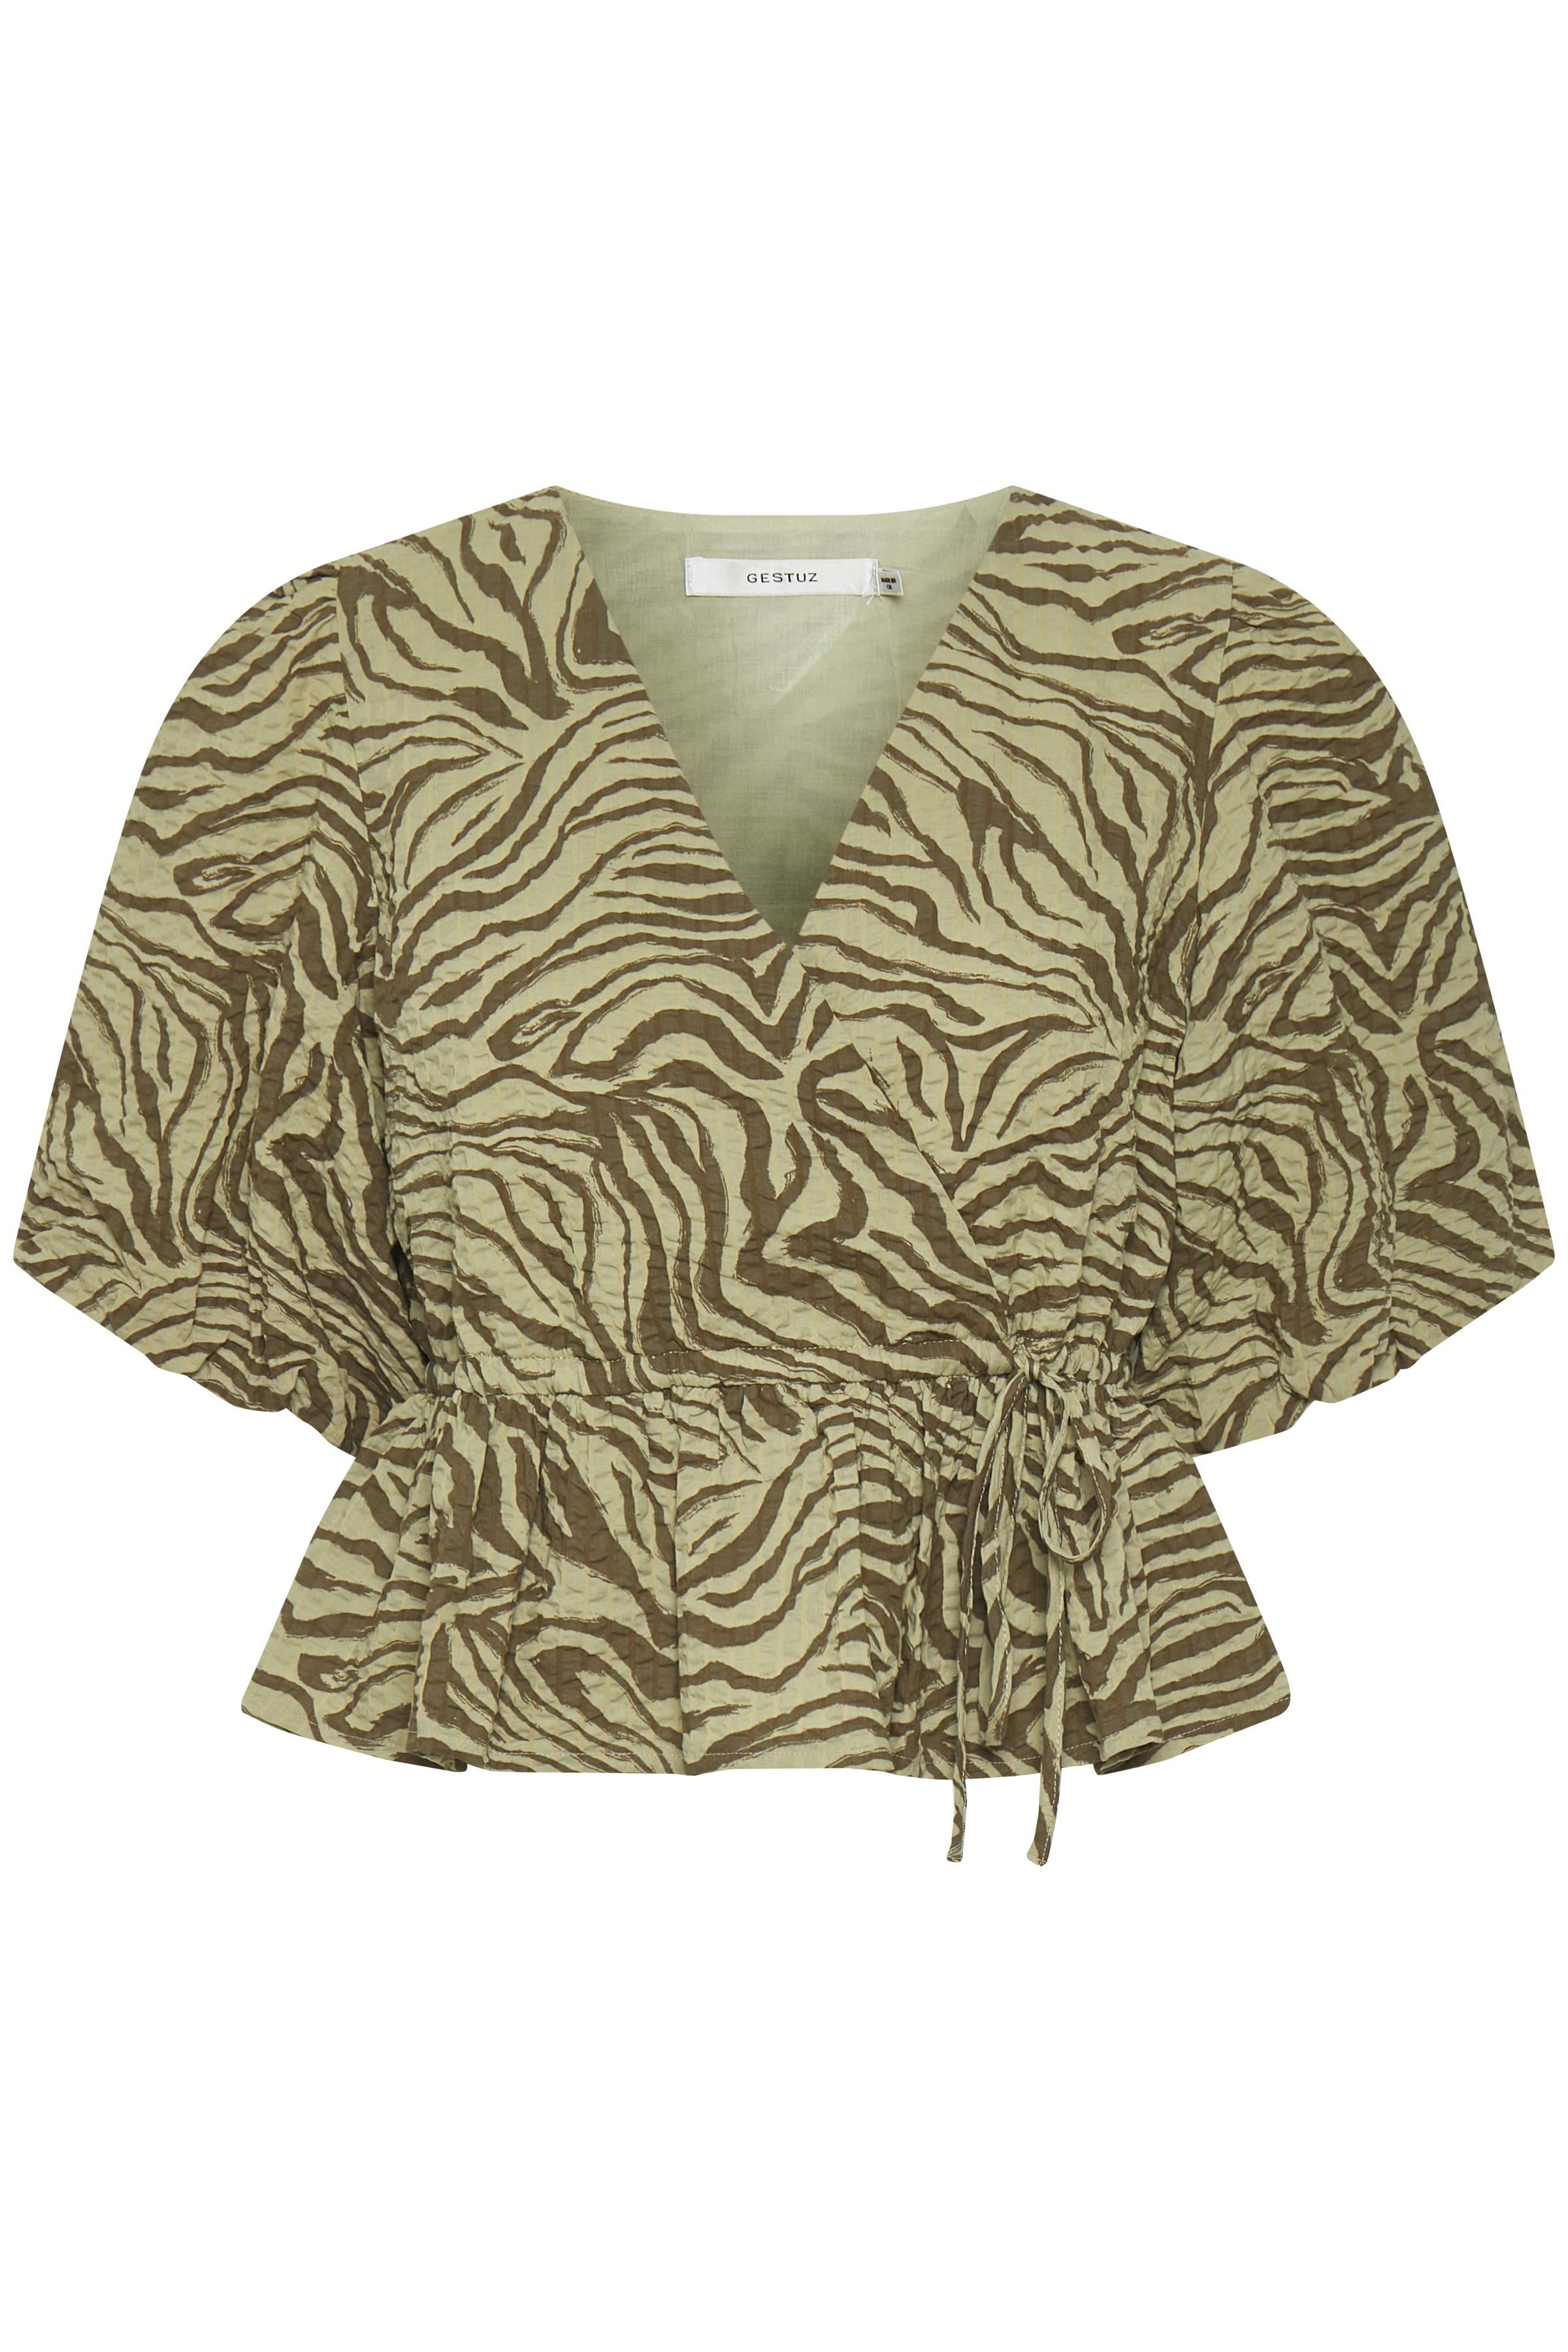 Gestuz AveryGZ bluse, elm zebra, 34